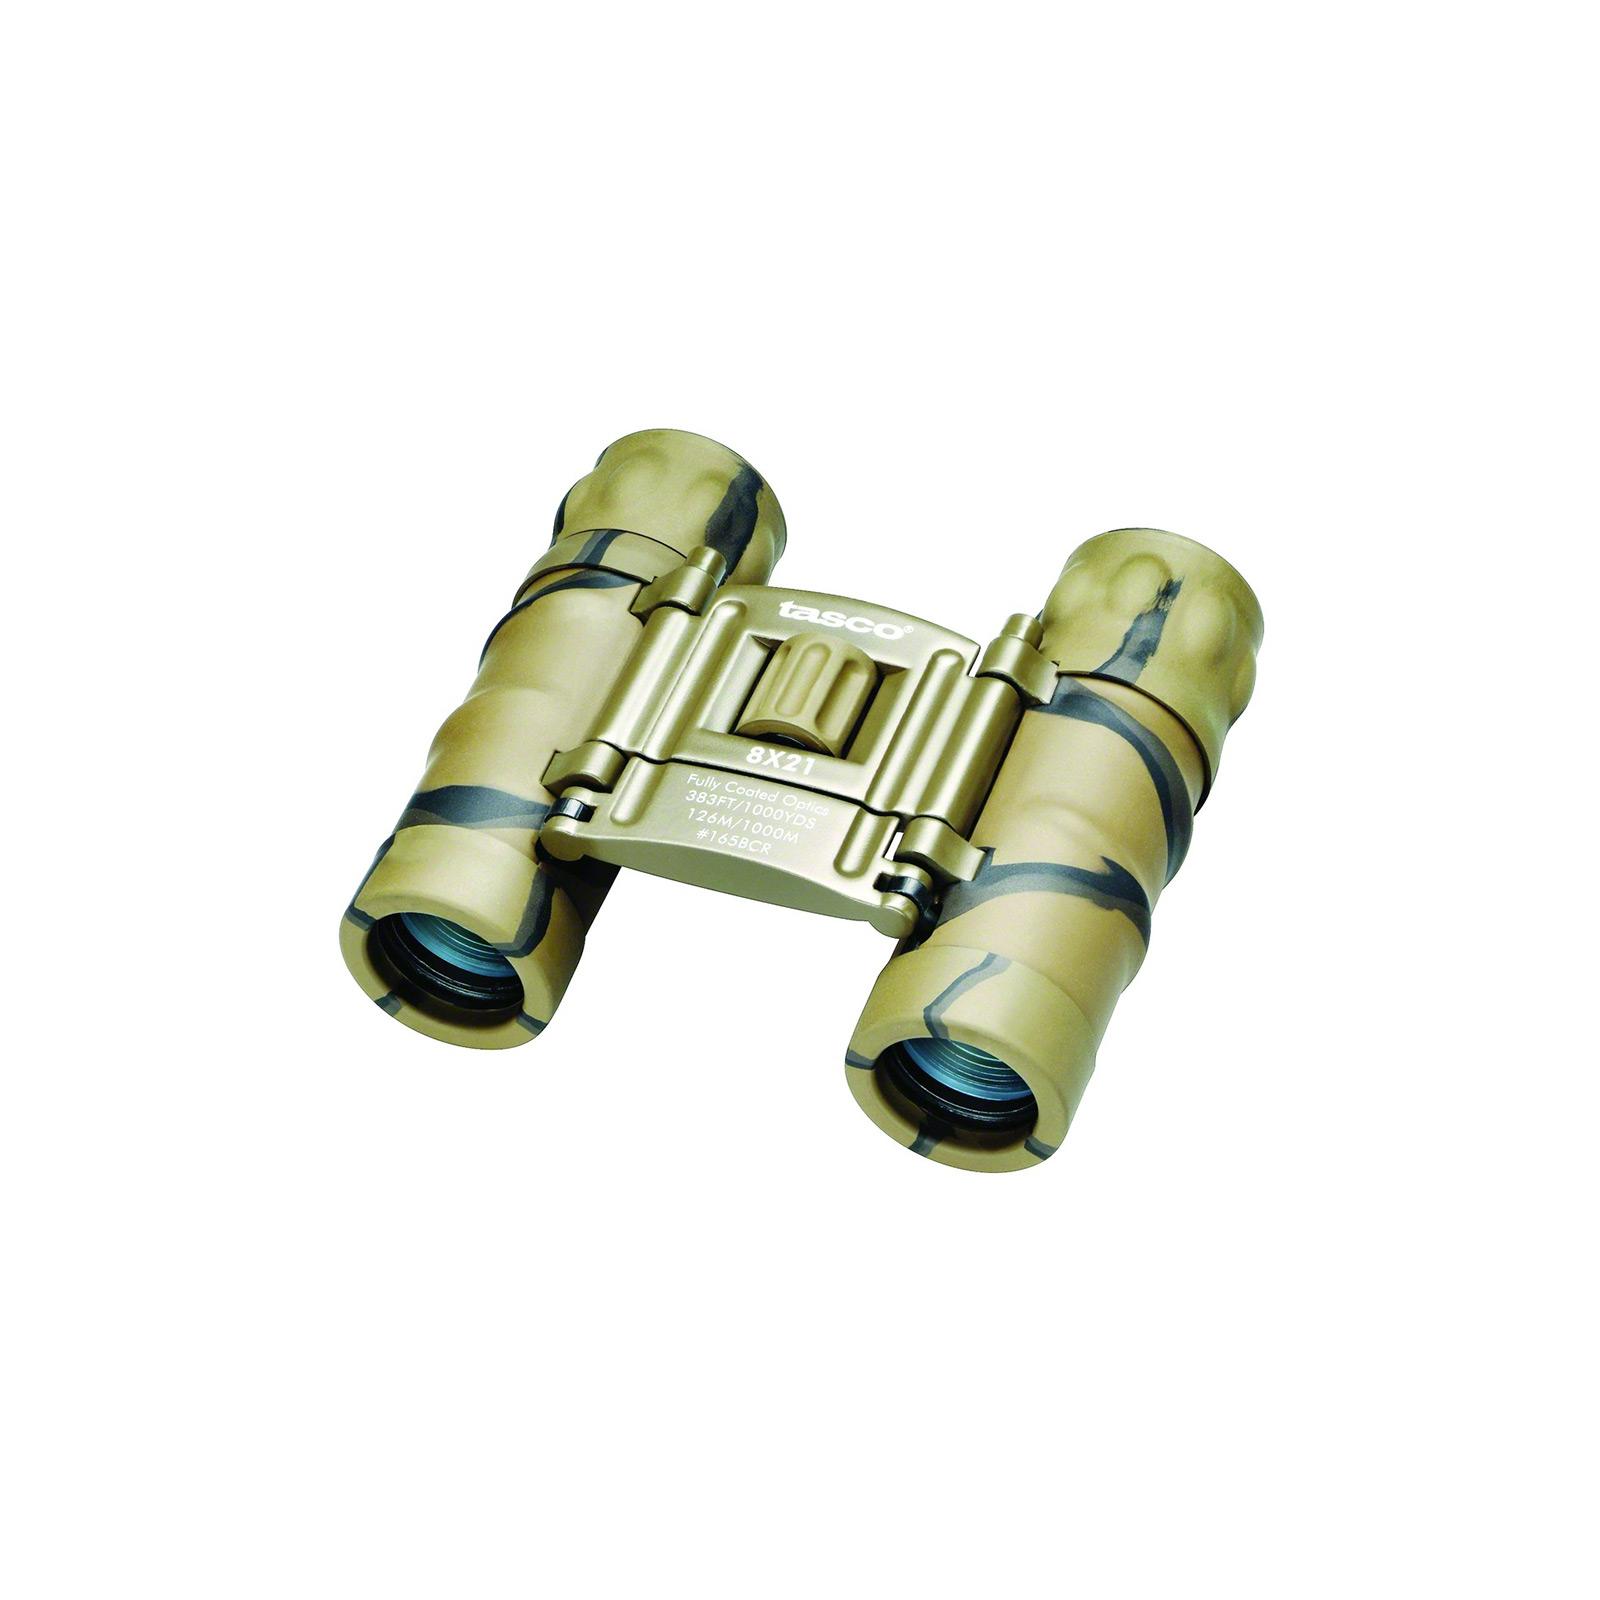 Tasco Essentials Binocular 8x21 FRP Camo Compact, 165BCRD